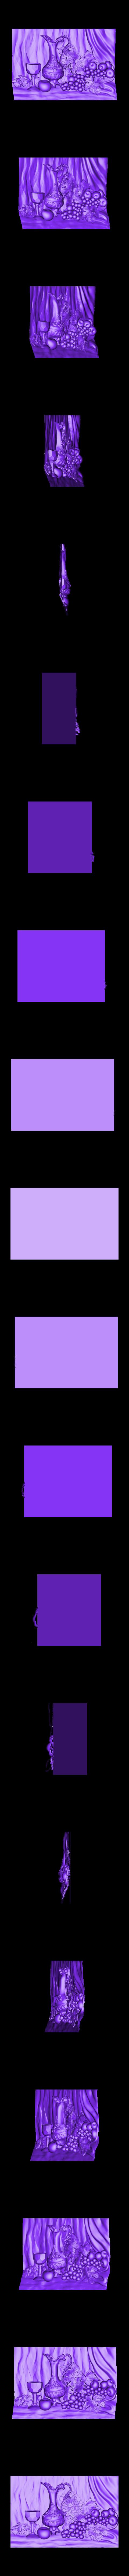 931_Panno.stl Download free STL file Grape • 3D print object, stl3dmodel